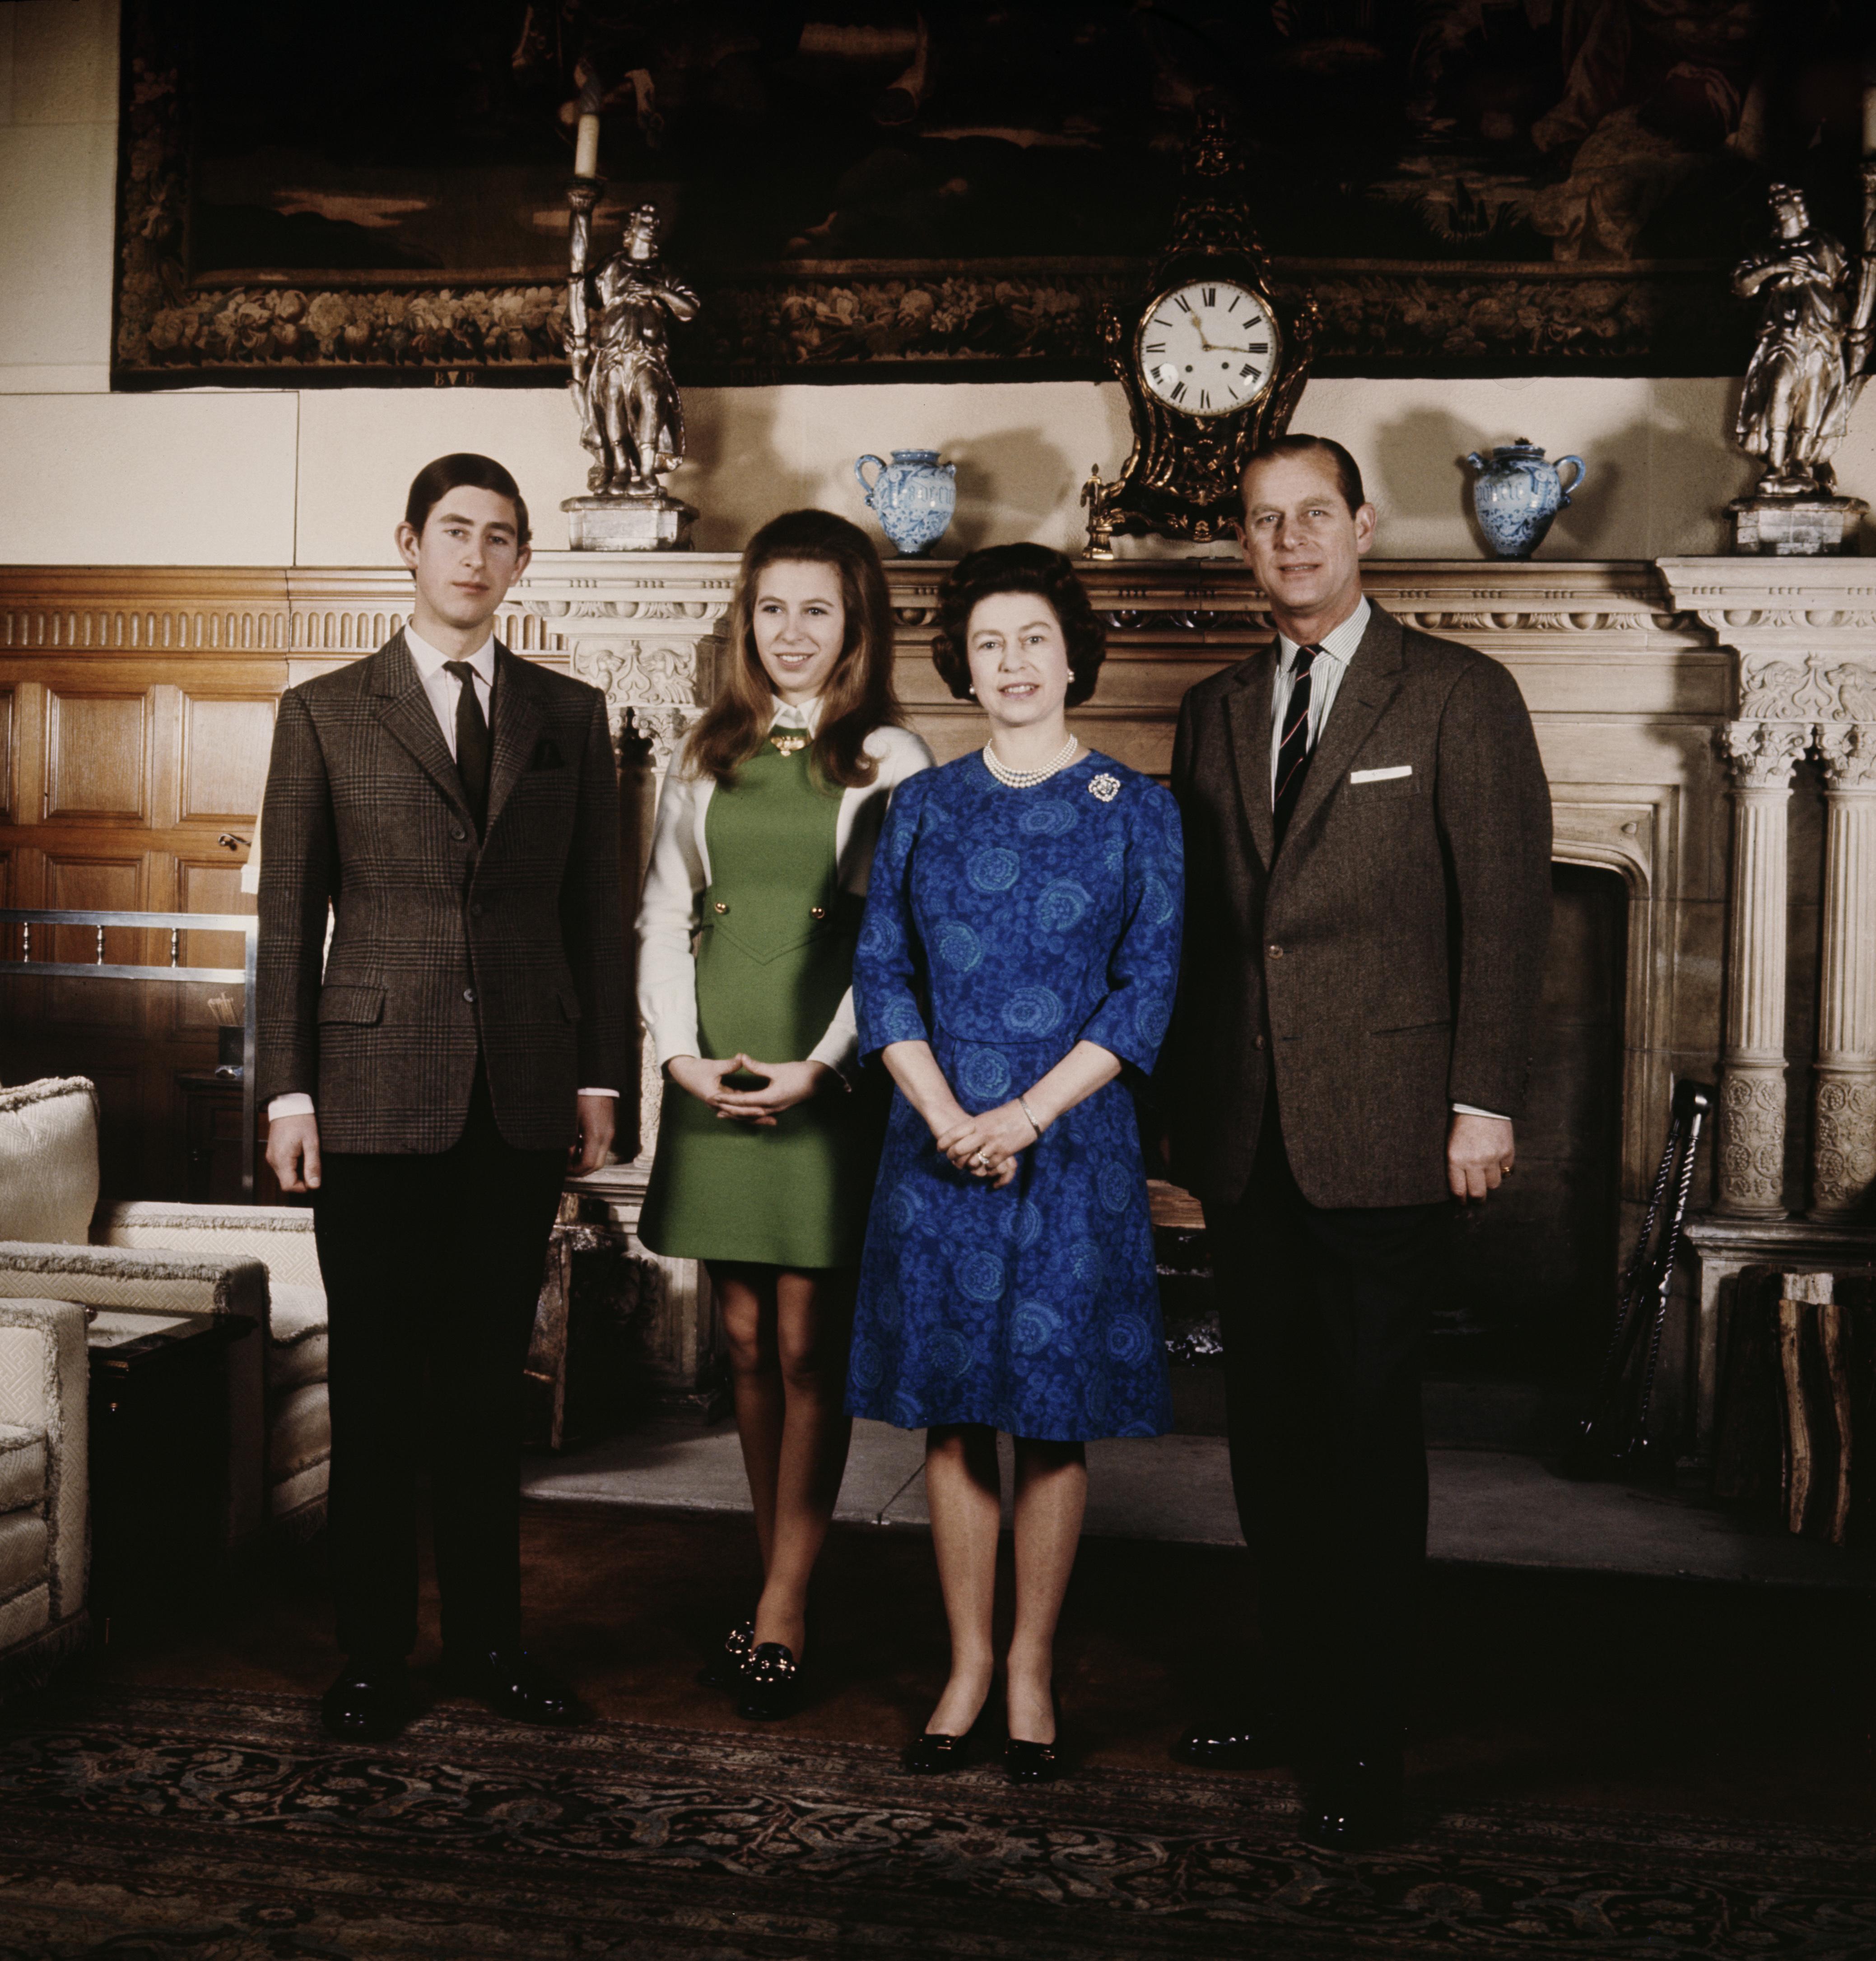 Queen Elizabeth Age 44 Getty Images